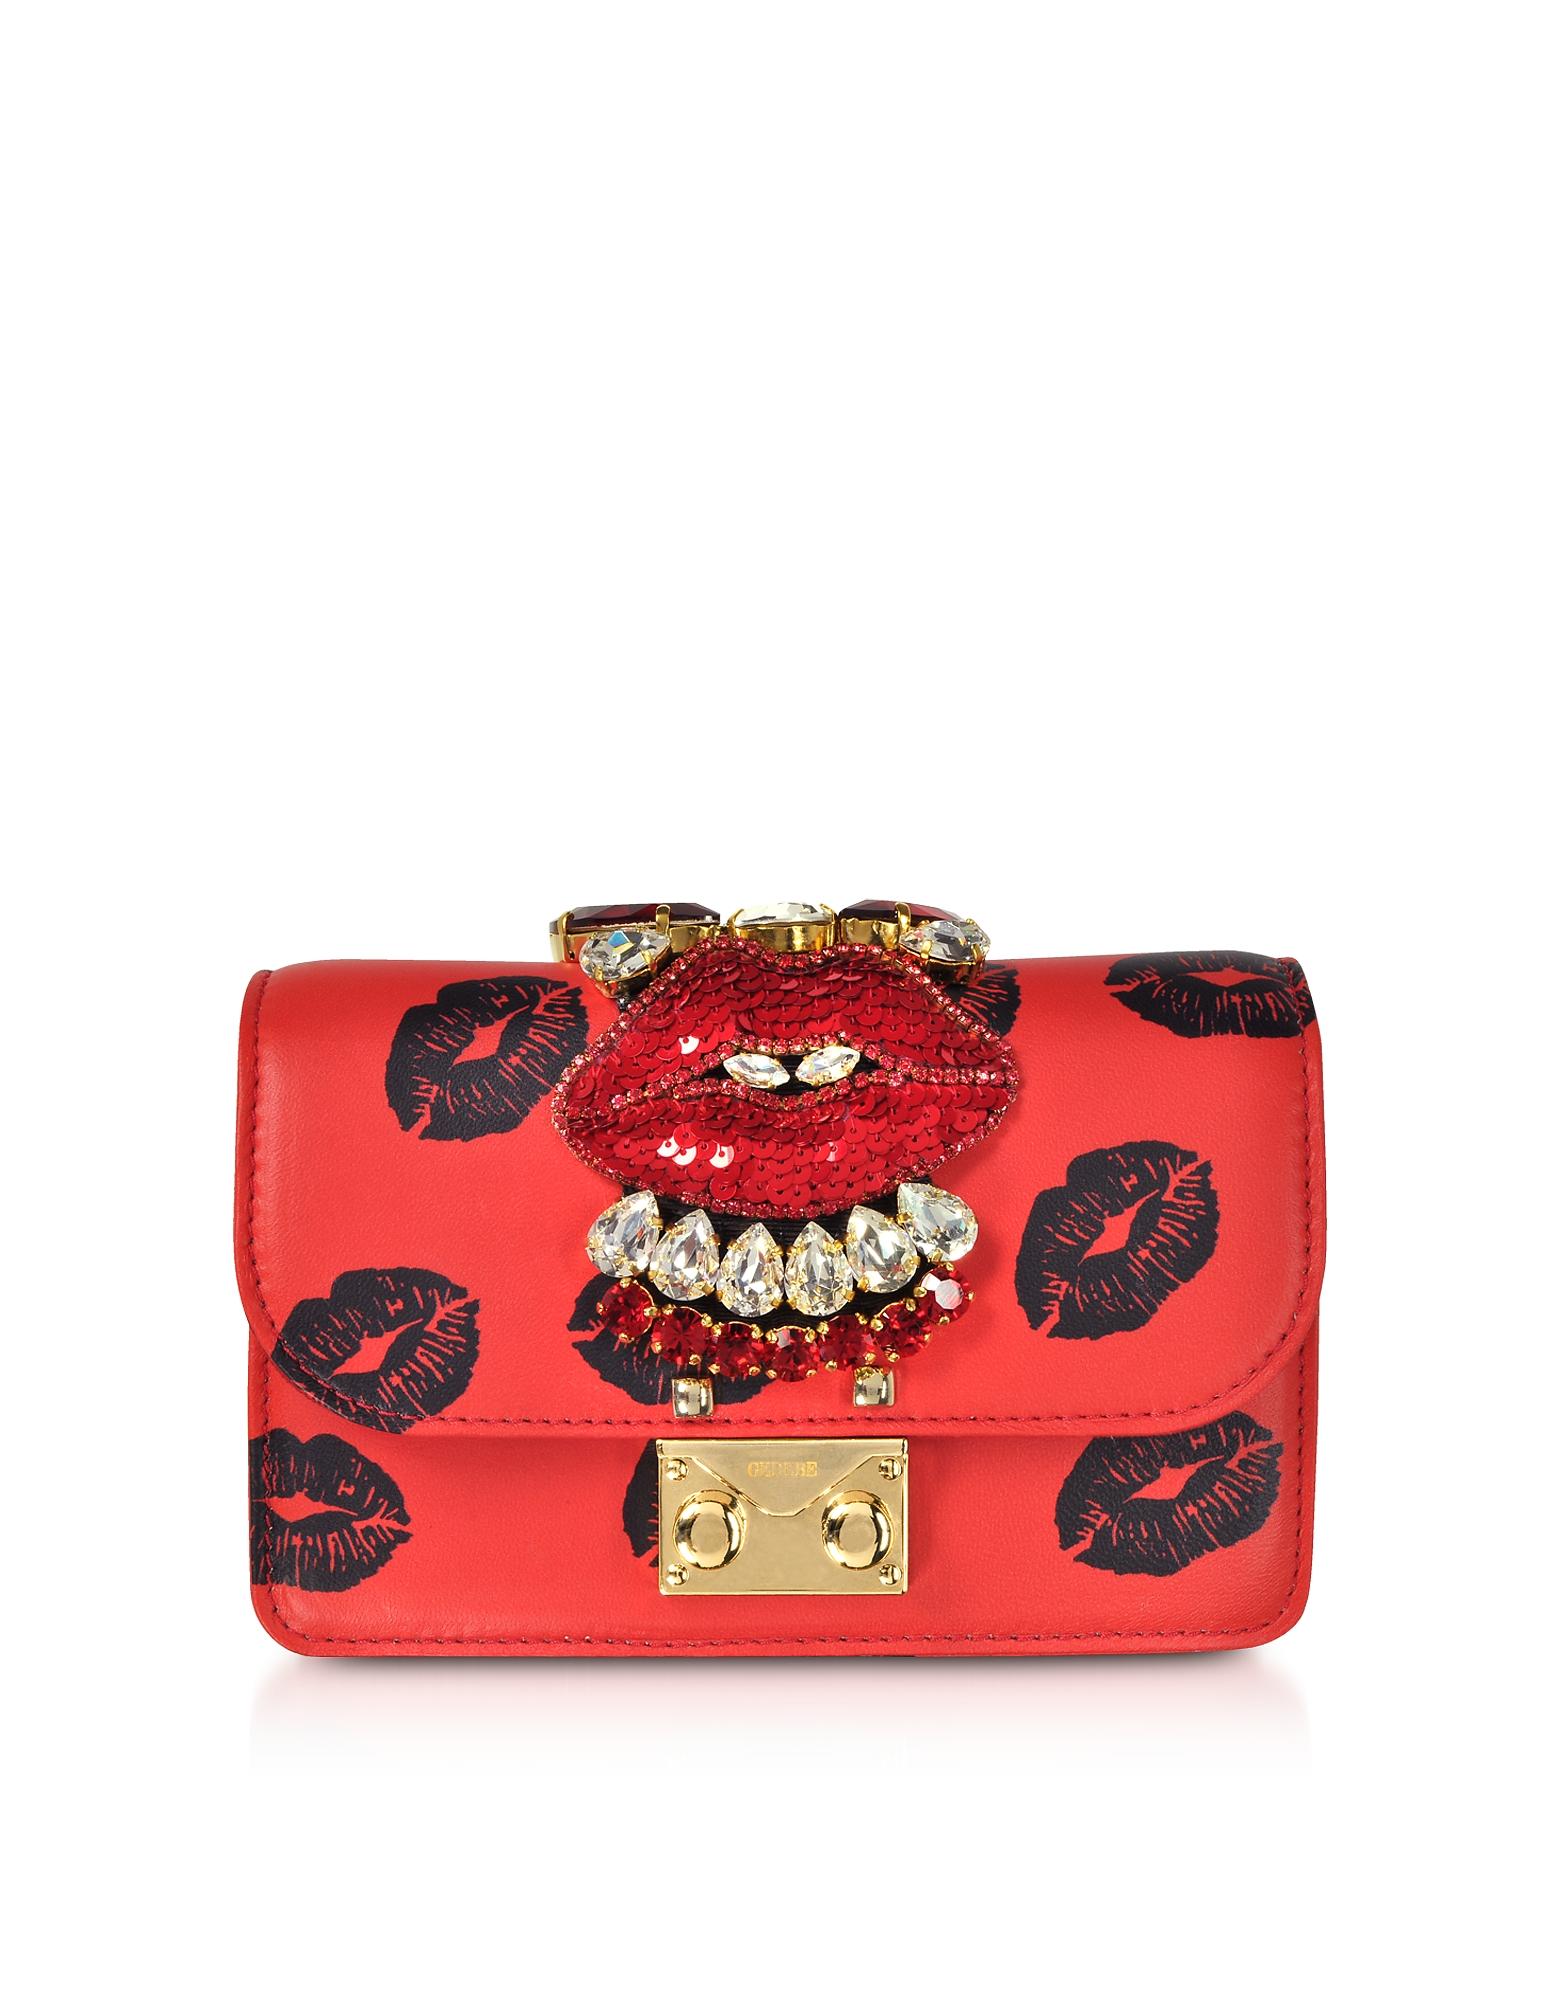 Image of Gedebe Designer Handbags, Mini Cliky Nappa Printed Red Lips Clutch w/Chain Strap